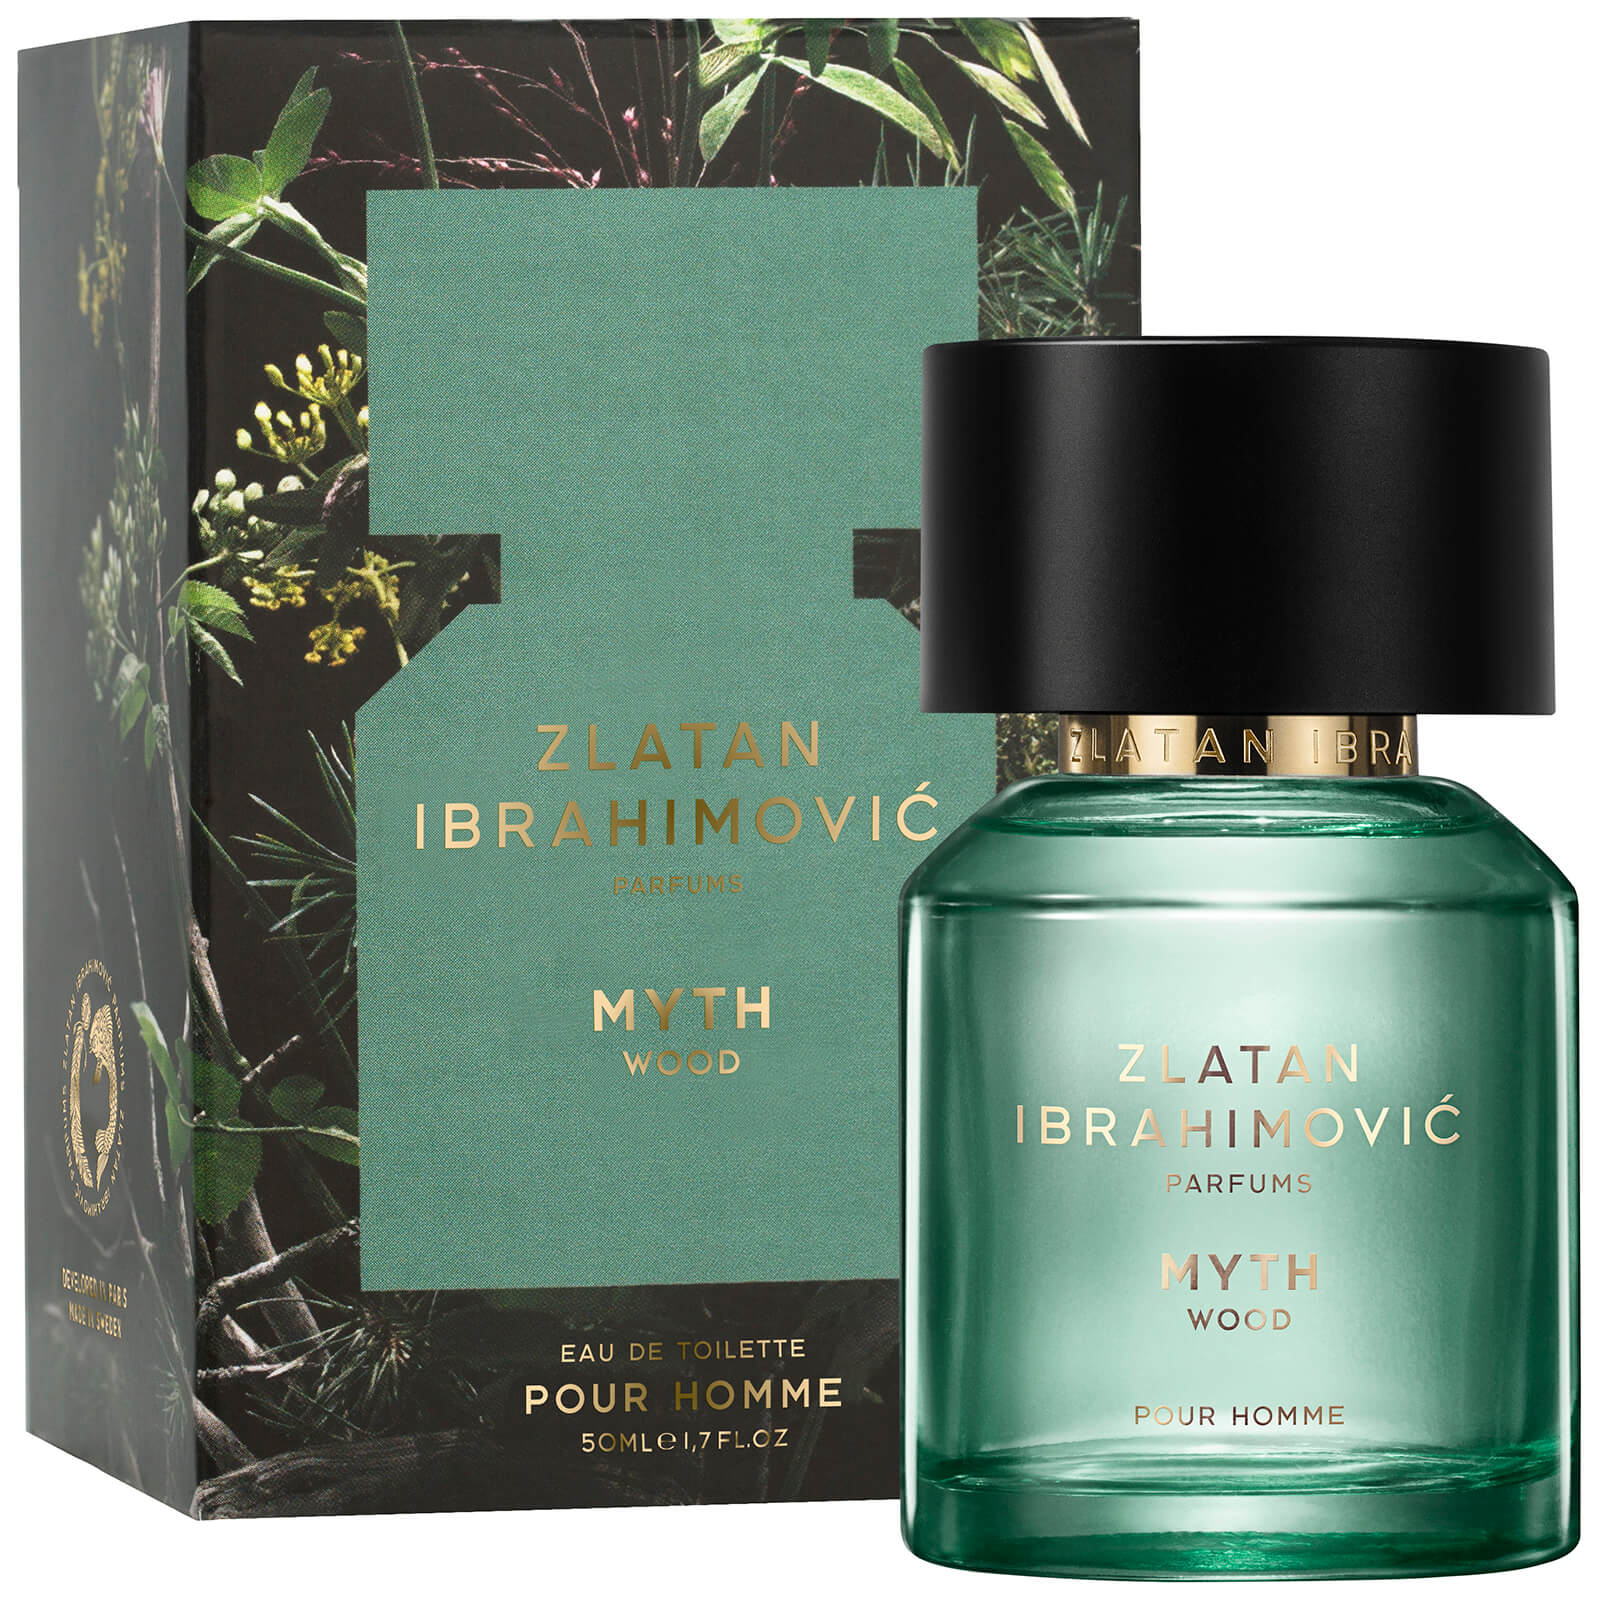 De Ibrahimovic 50ml Wood Zlatan Myth Eau Toilette Parfums Homme dCBerxoW